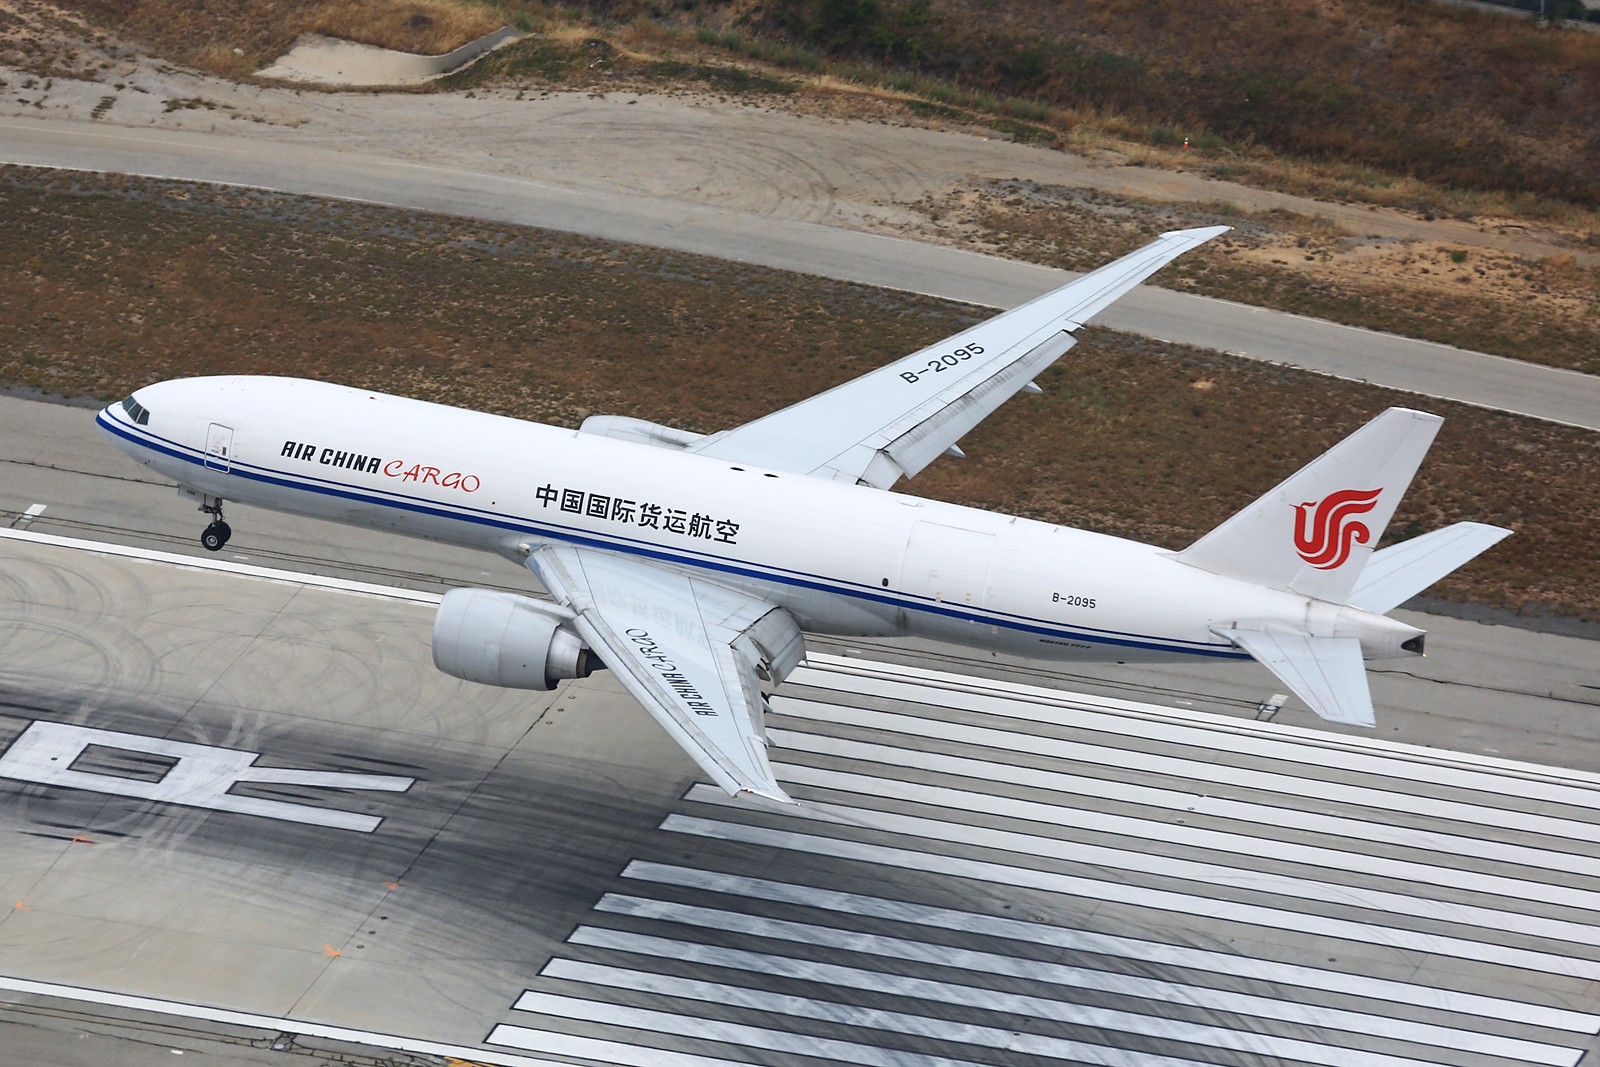 Re:[原创]【LAX】**********777级了,空对空&空对地部分777合集[1600*1067]********** BOEING 777-FFT B-2095 美国洛杉矶机场